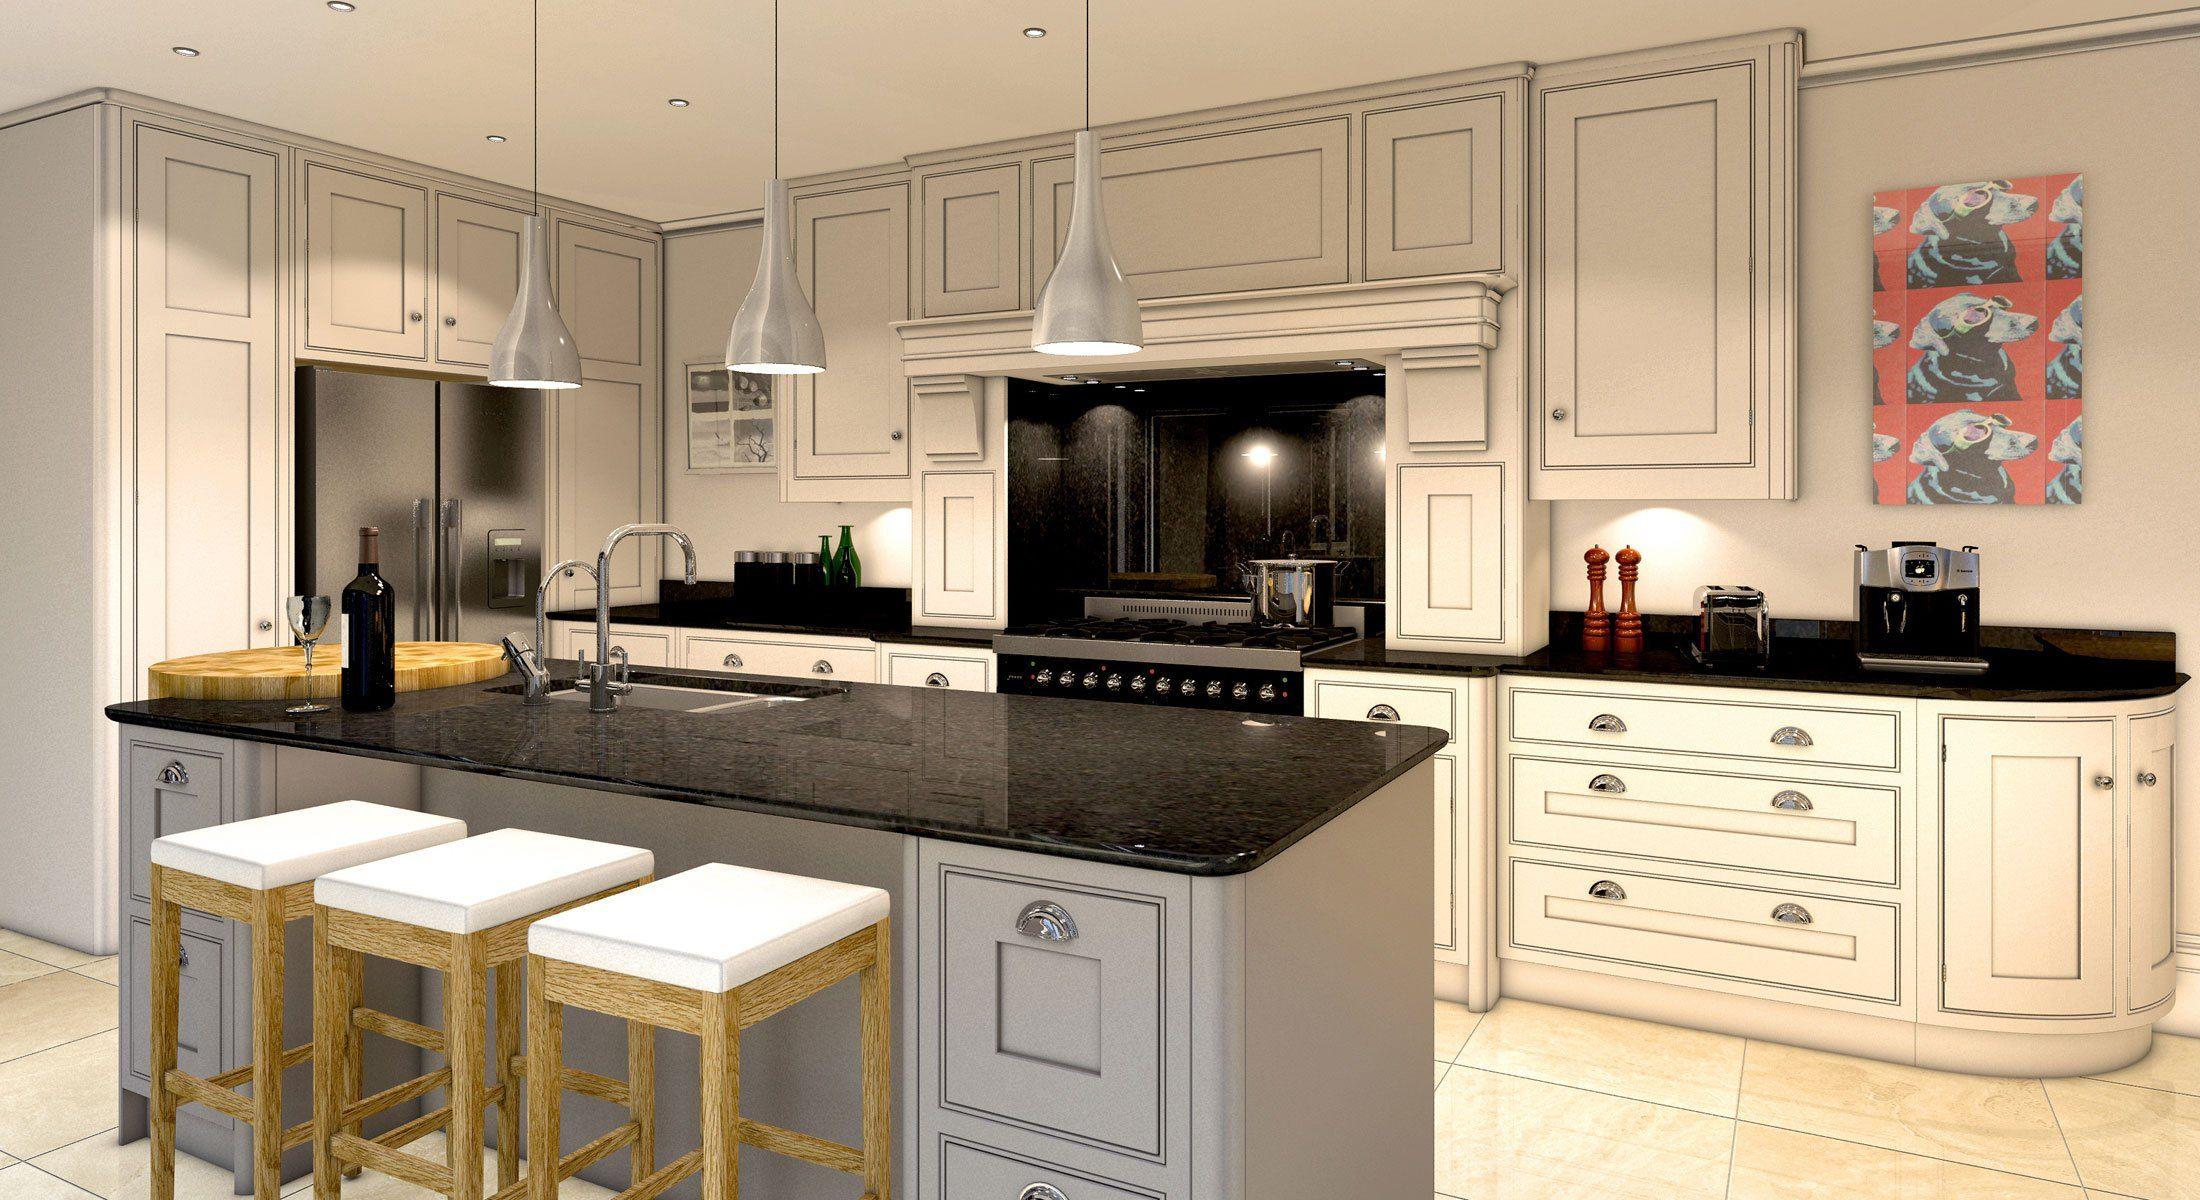 luxury kitchen fulwithmill harrogate luxury build development luxury ...